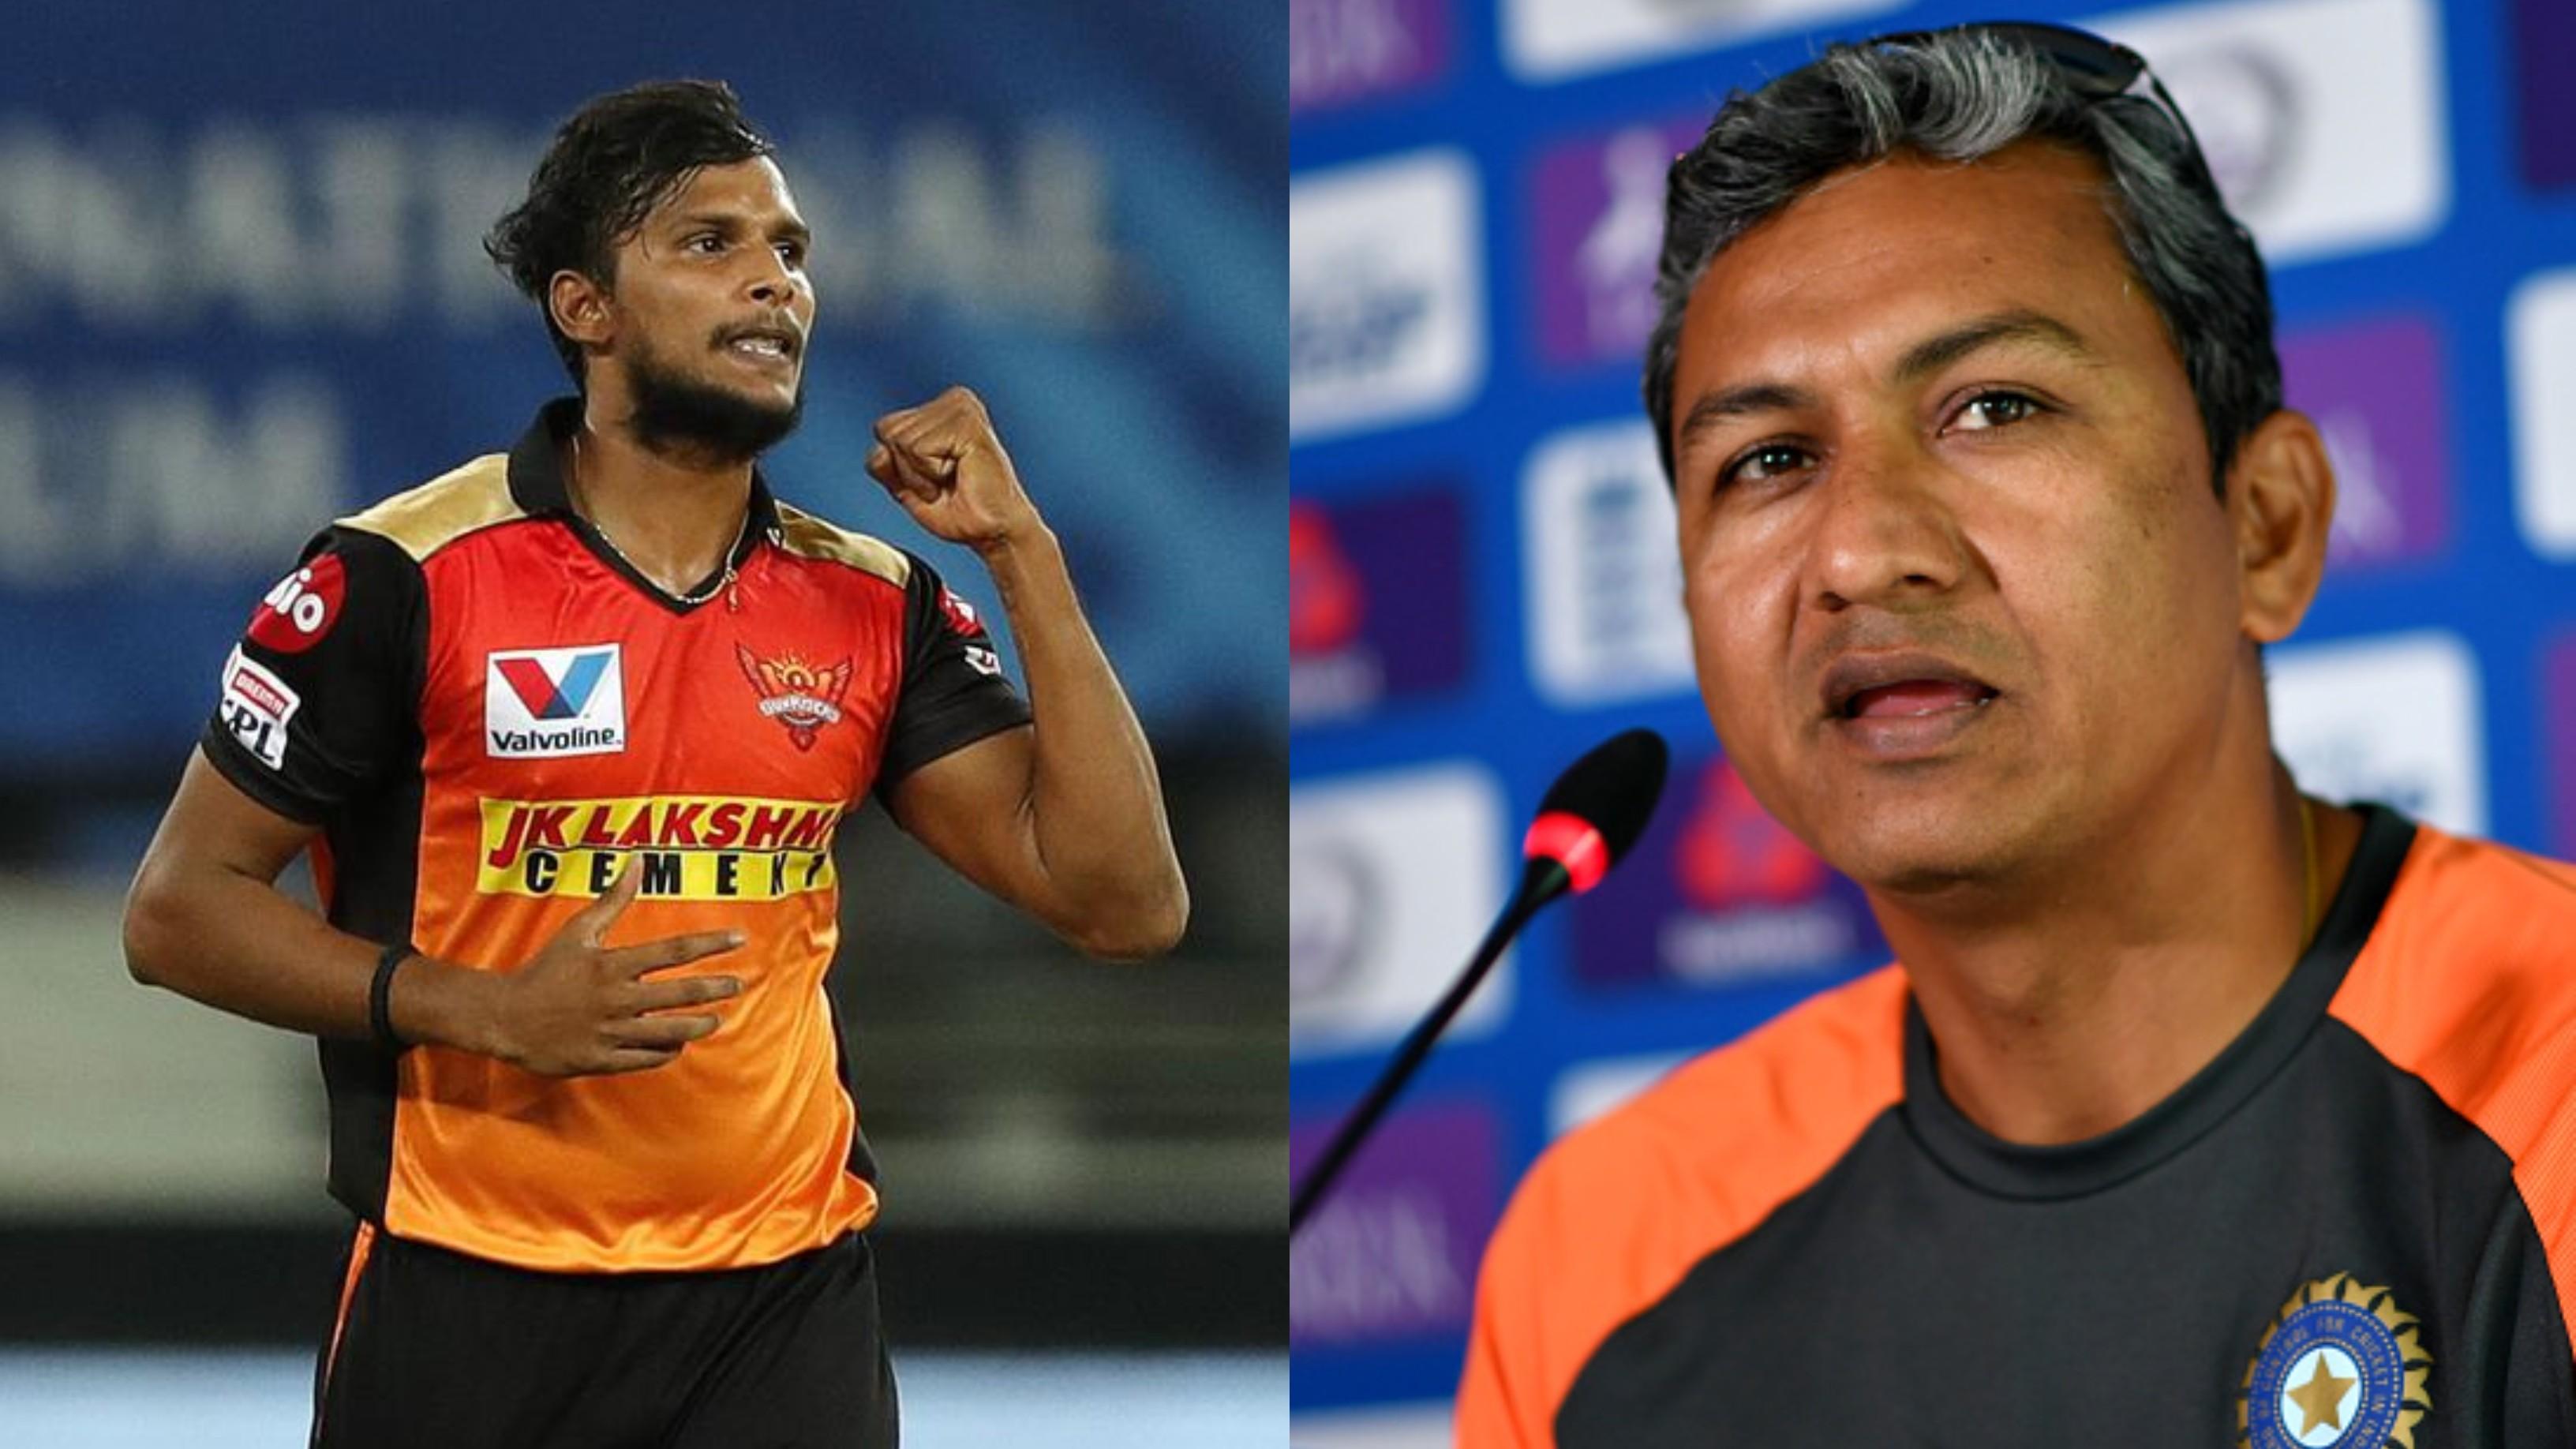 IPL 2020: Sanjay Bangar praises SRH's new yorker specialist T Natarajan